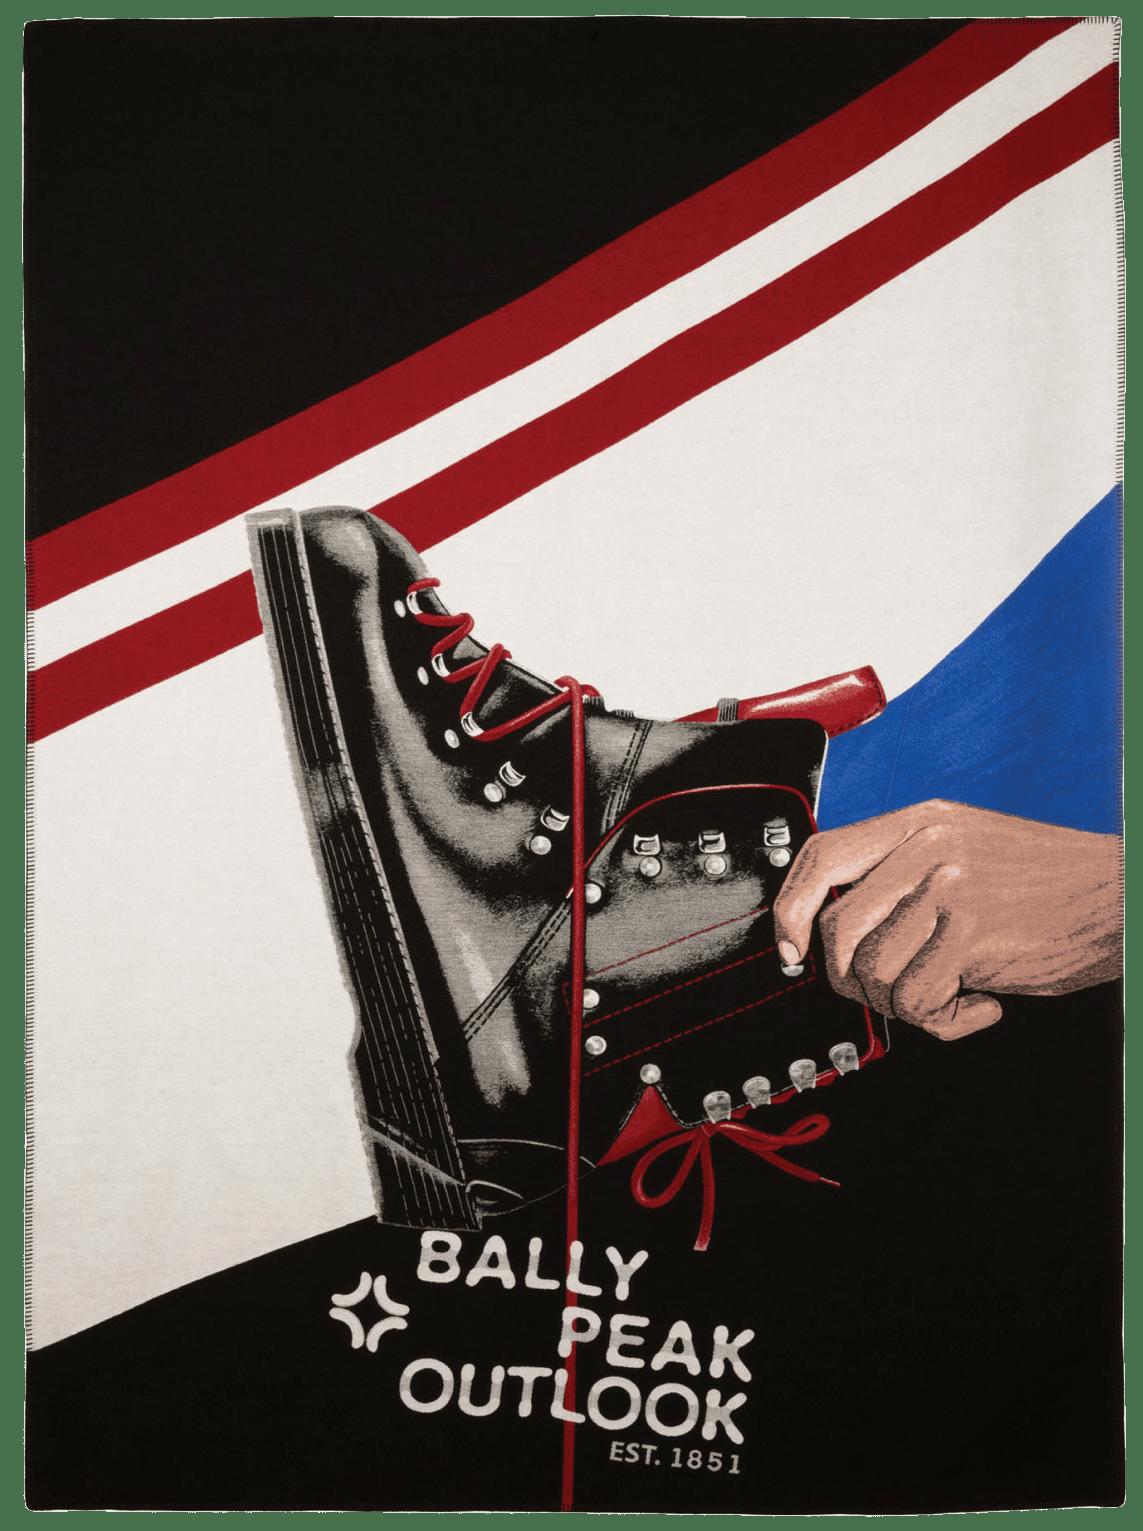 Decke aus der Bally Peak Outlook Capsule Collection